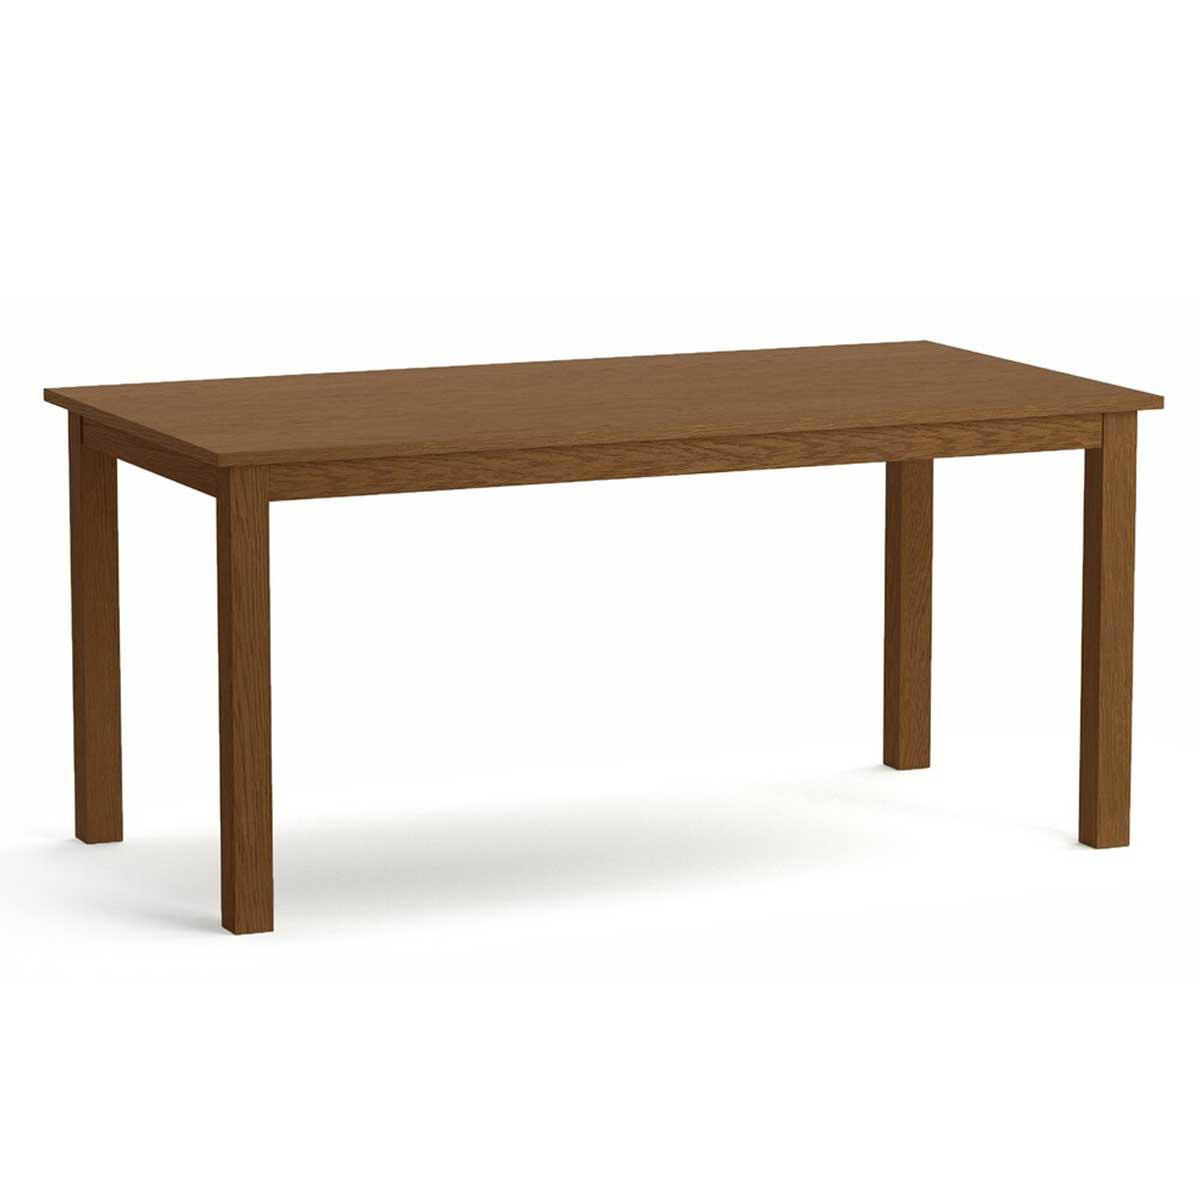 "Picture of SELWYN 78"" OAK COUNTER TABLE"